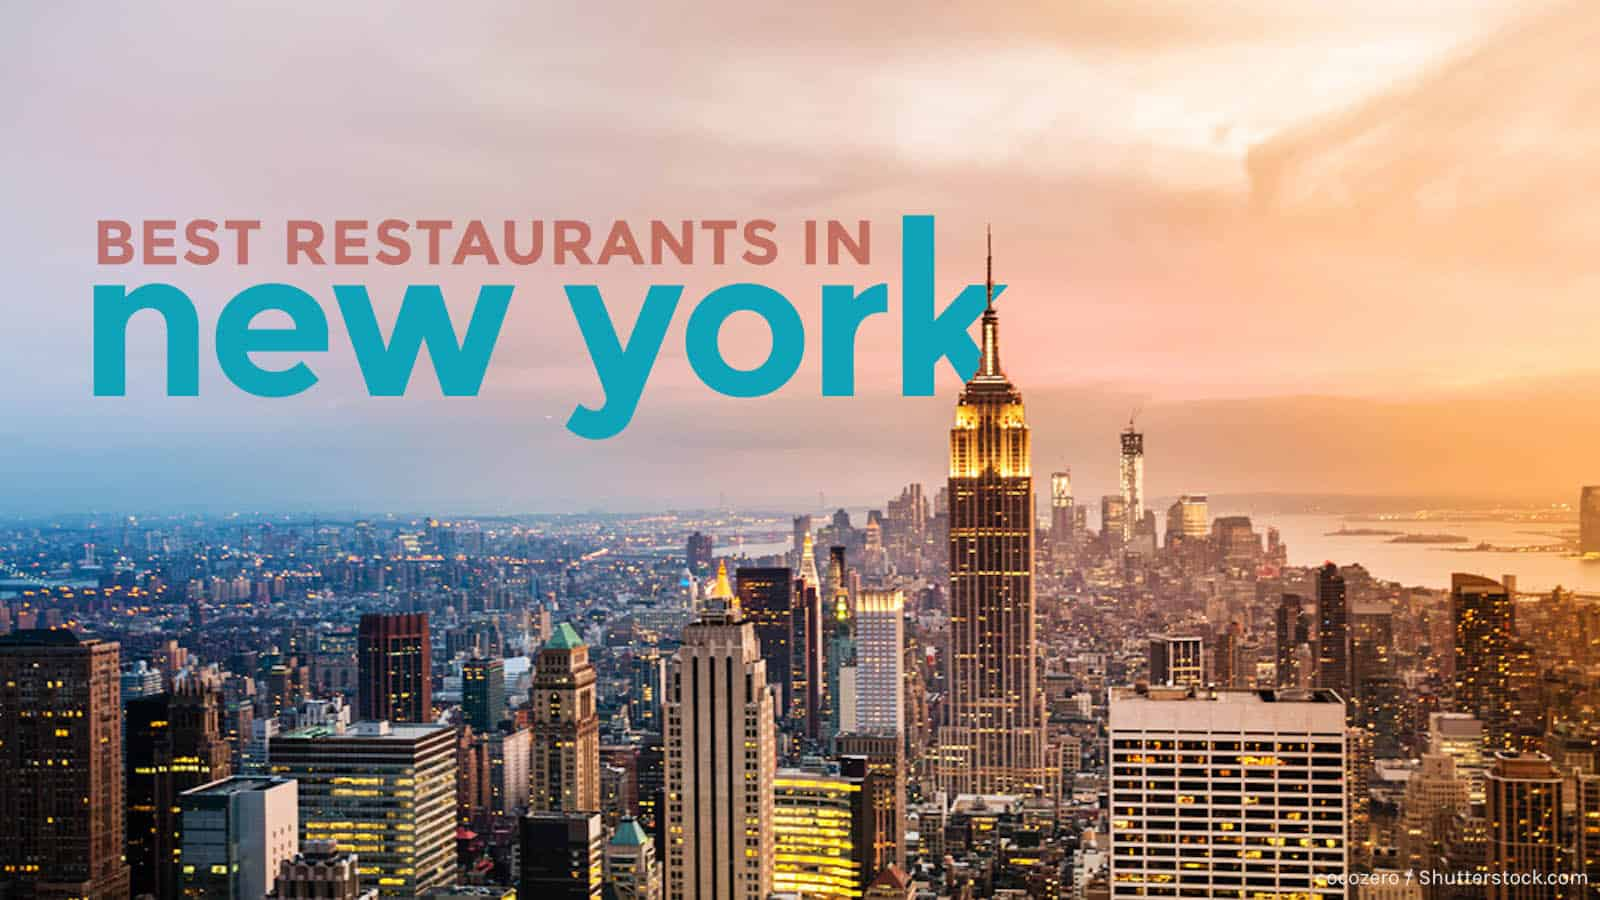 justfly reviews top 10 best restaurants in new york city the poor